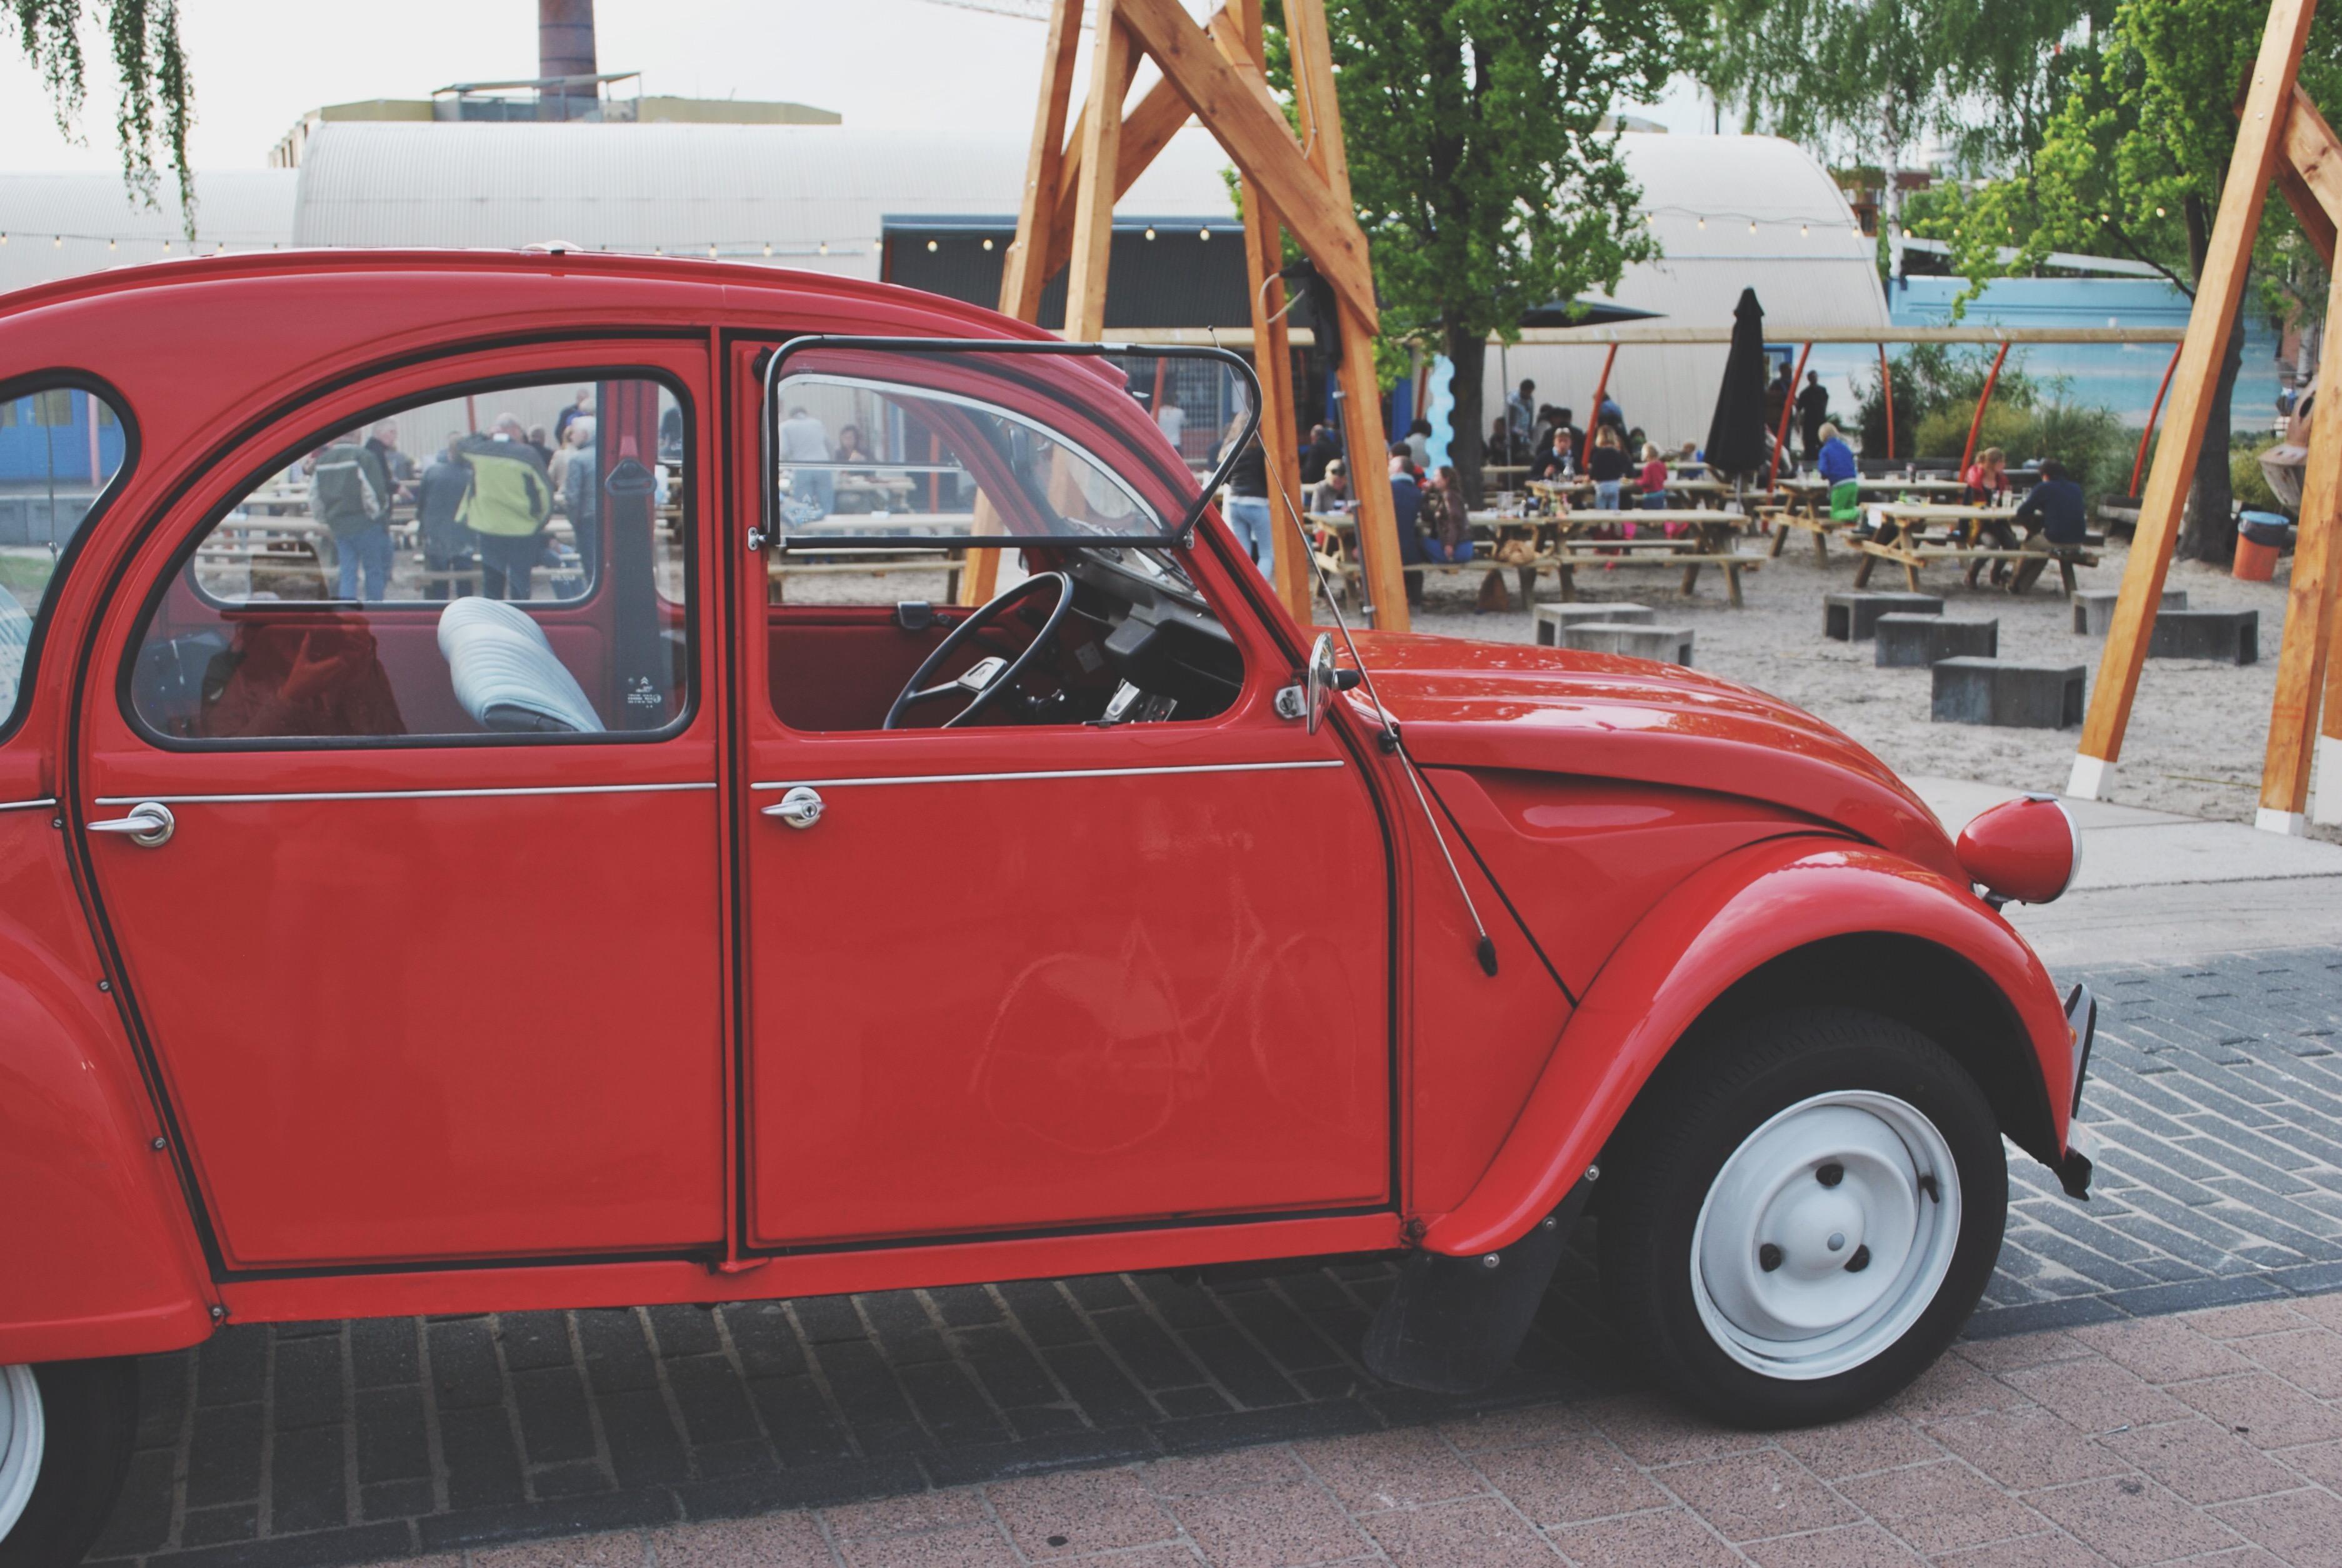 Amersfoort Weekendje Weg-3